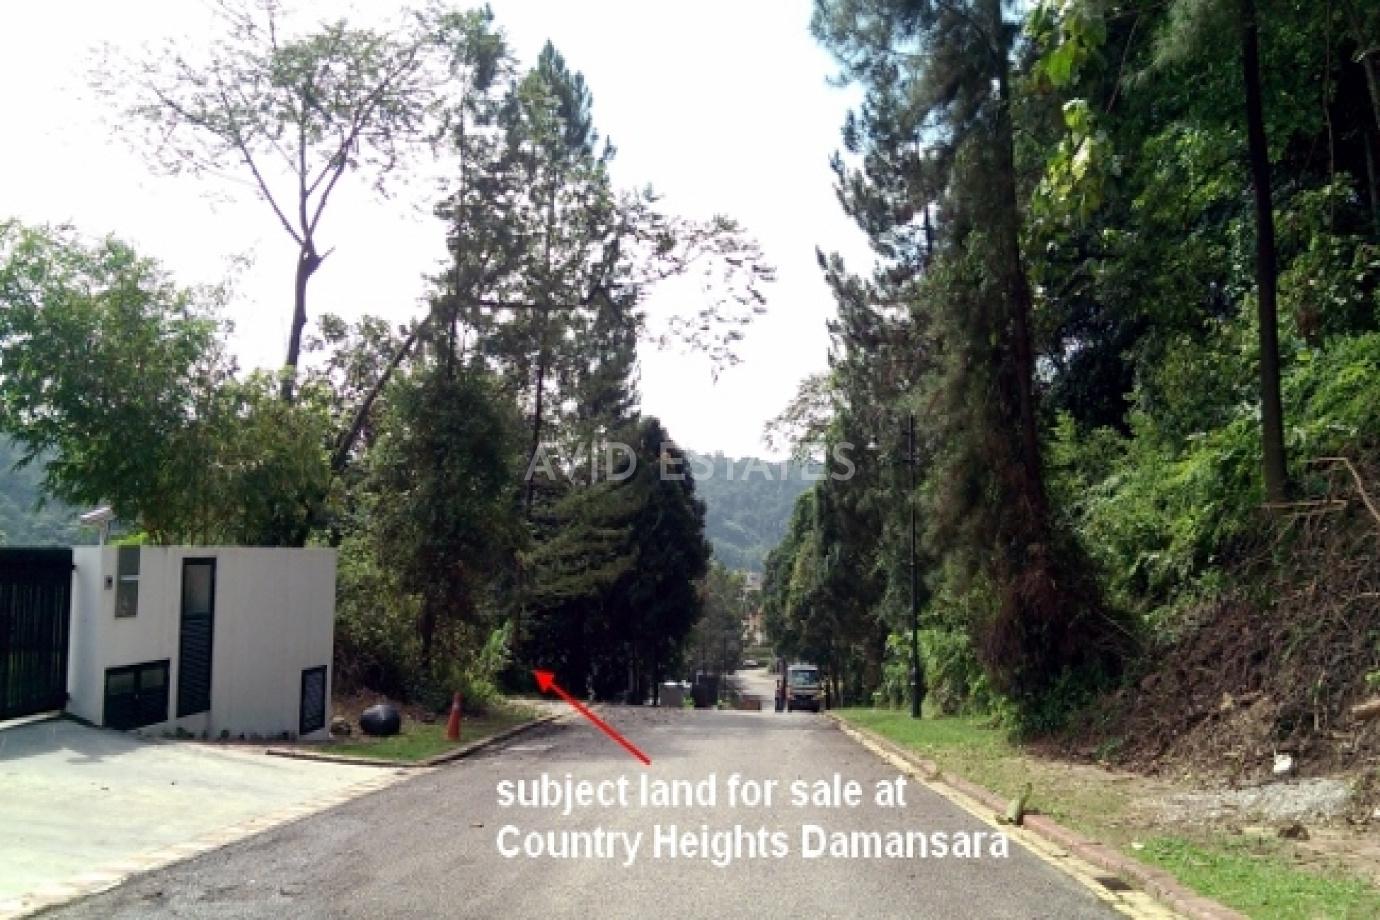 Country Heights Damansara, Kuala Lumpur,Kuala Lumpur, ,Vacant Land,For Sale,Country Height Damansara,Country Height Damansara,1280